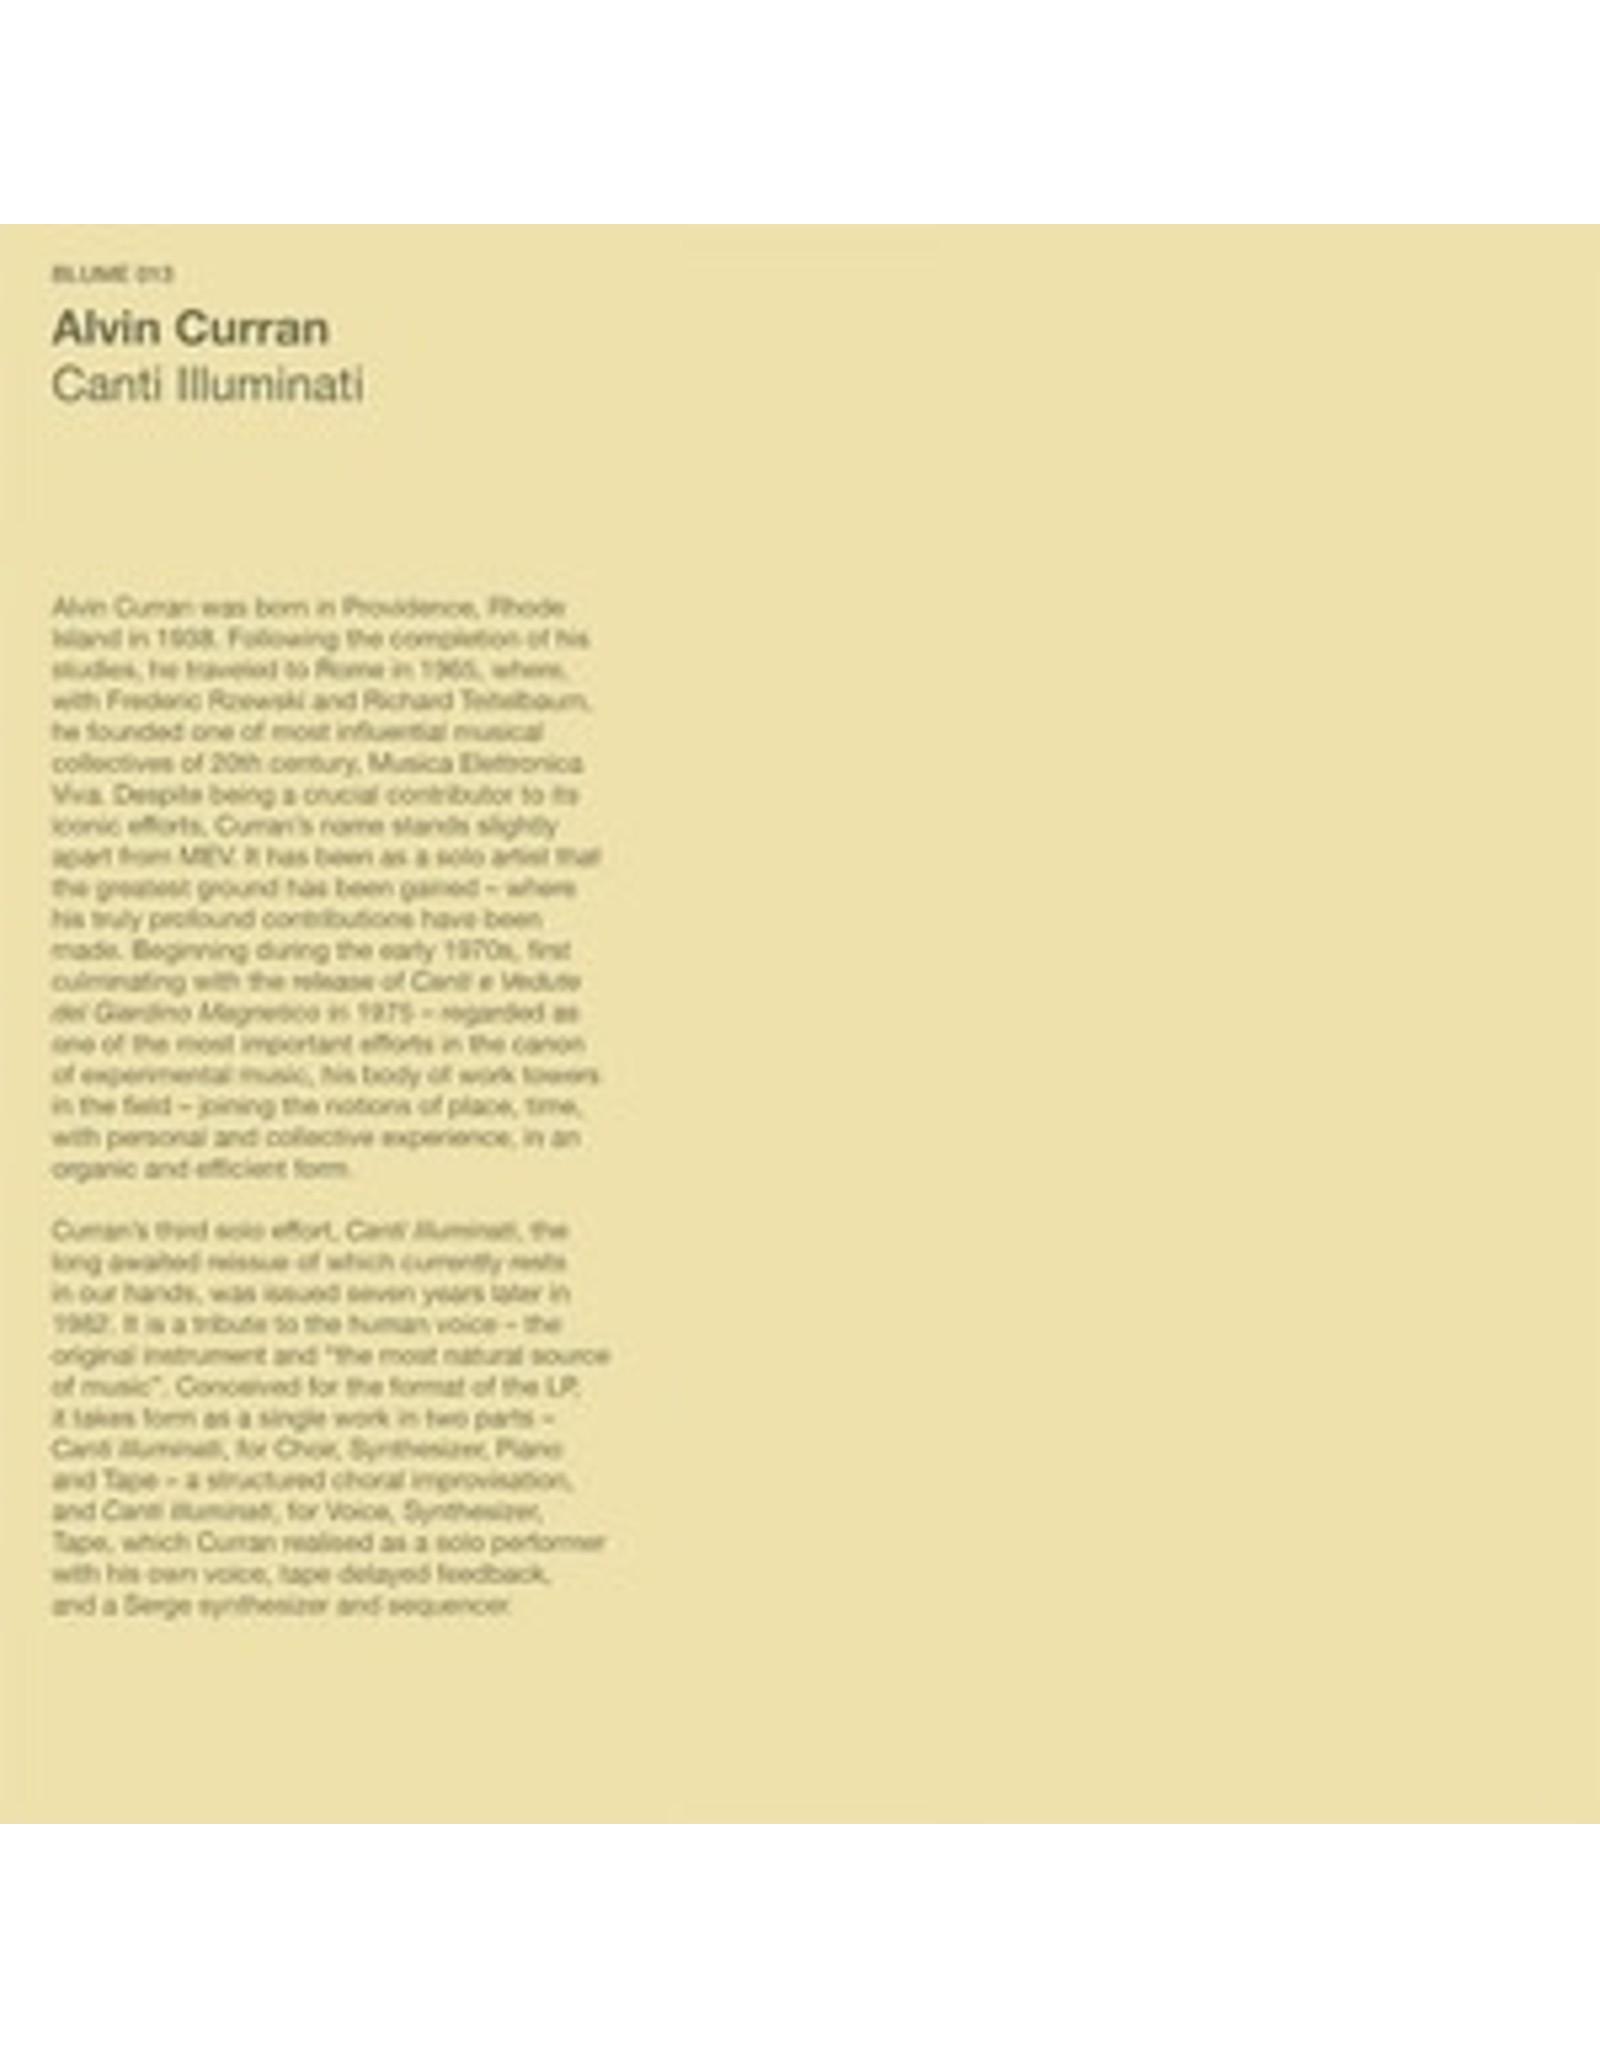 Blume Curran, Alvin: Canti Iluminati LP